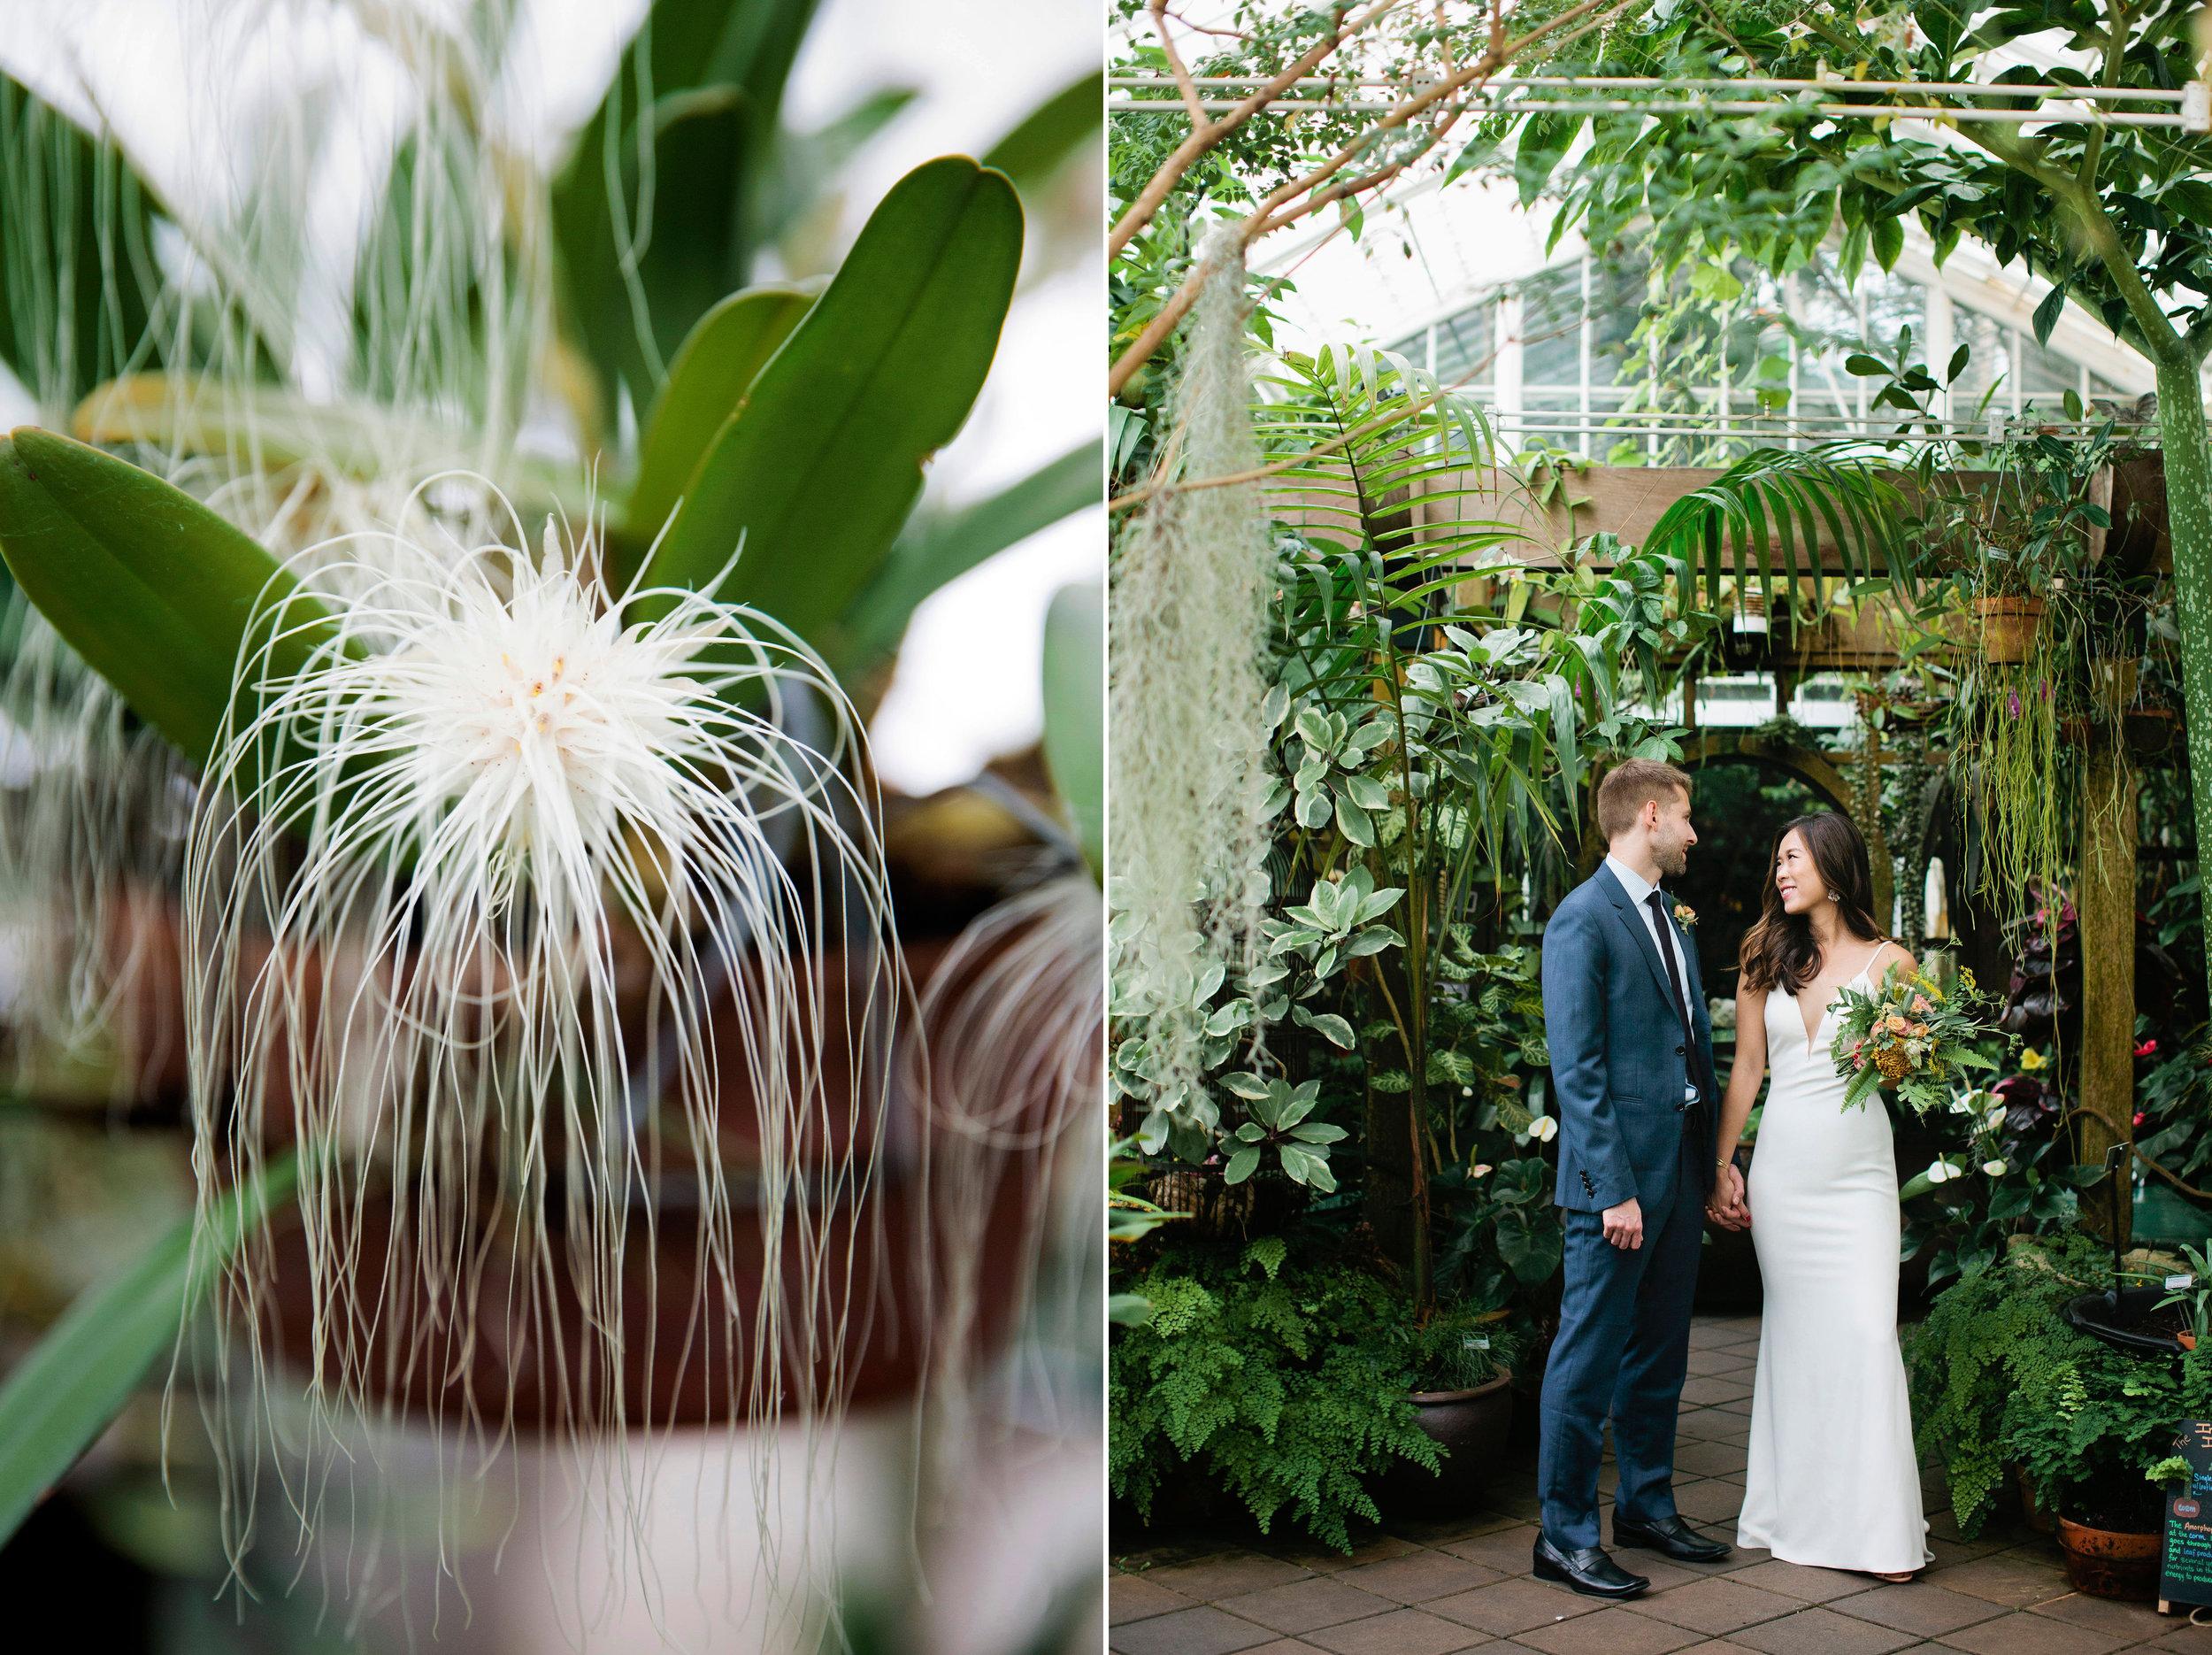 Conservatory-of-Flowers-Wedding-10 copy.jpg